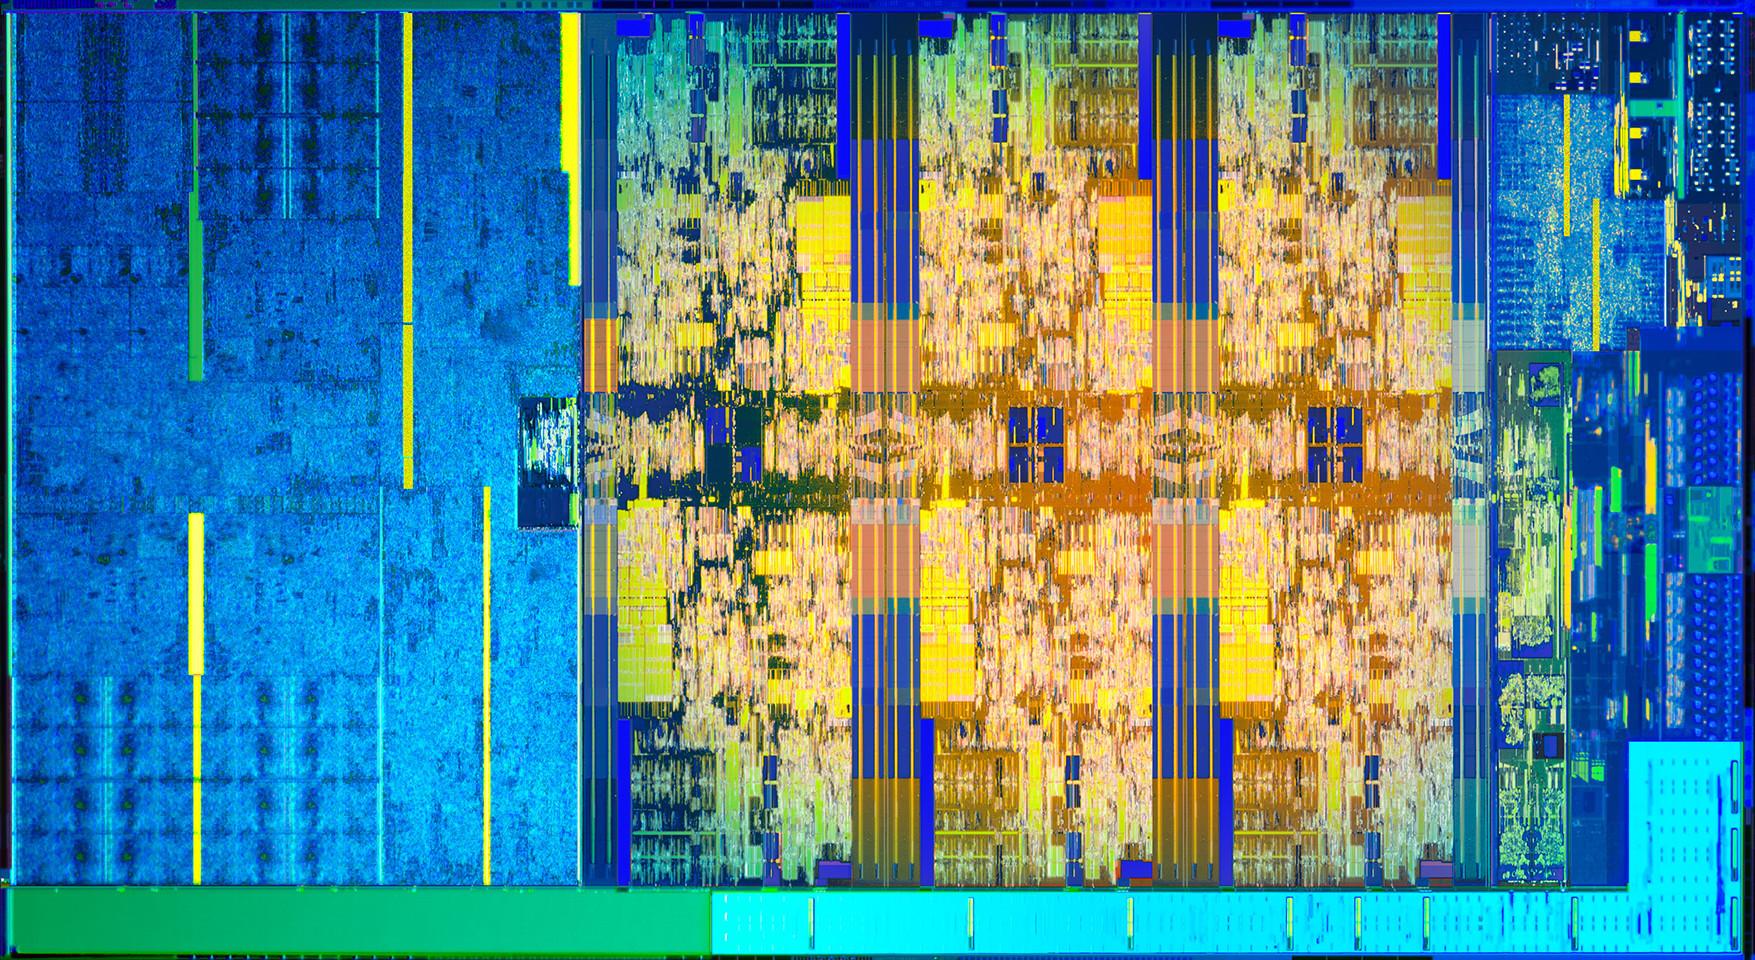 Intel Released